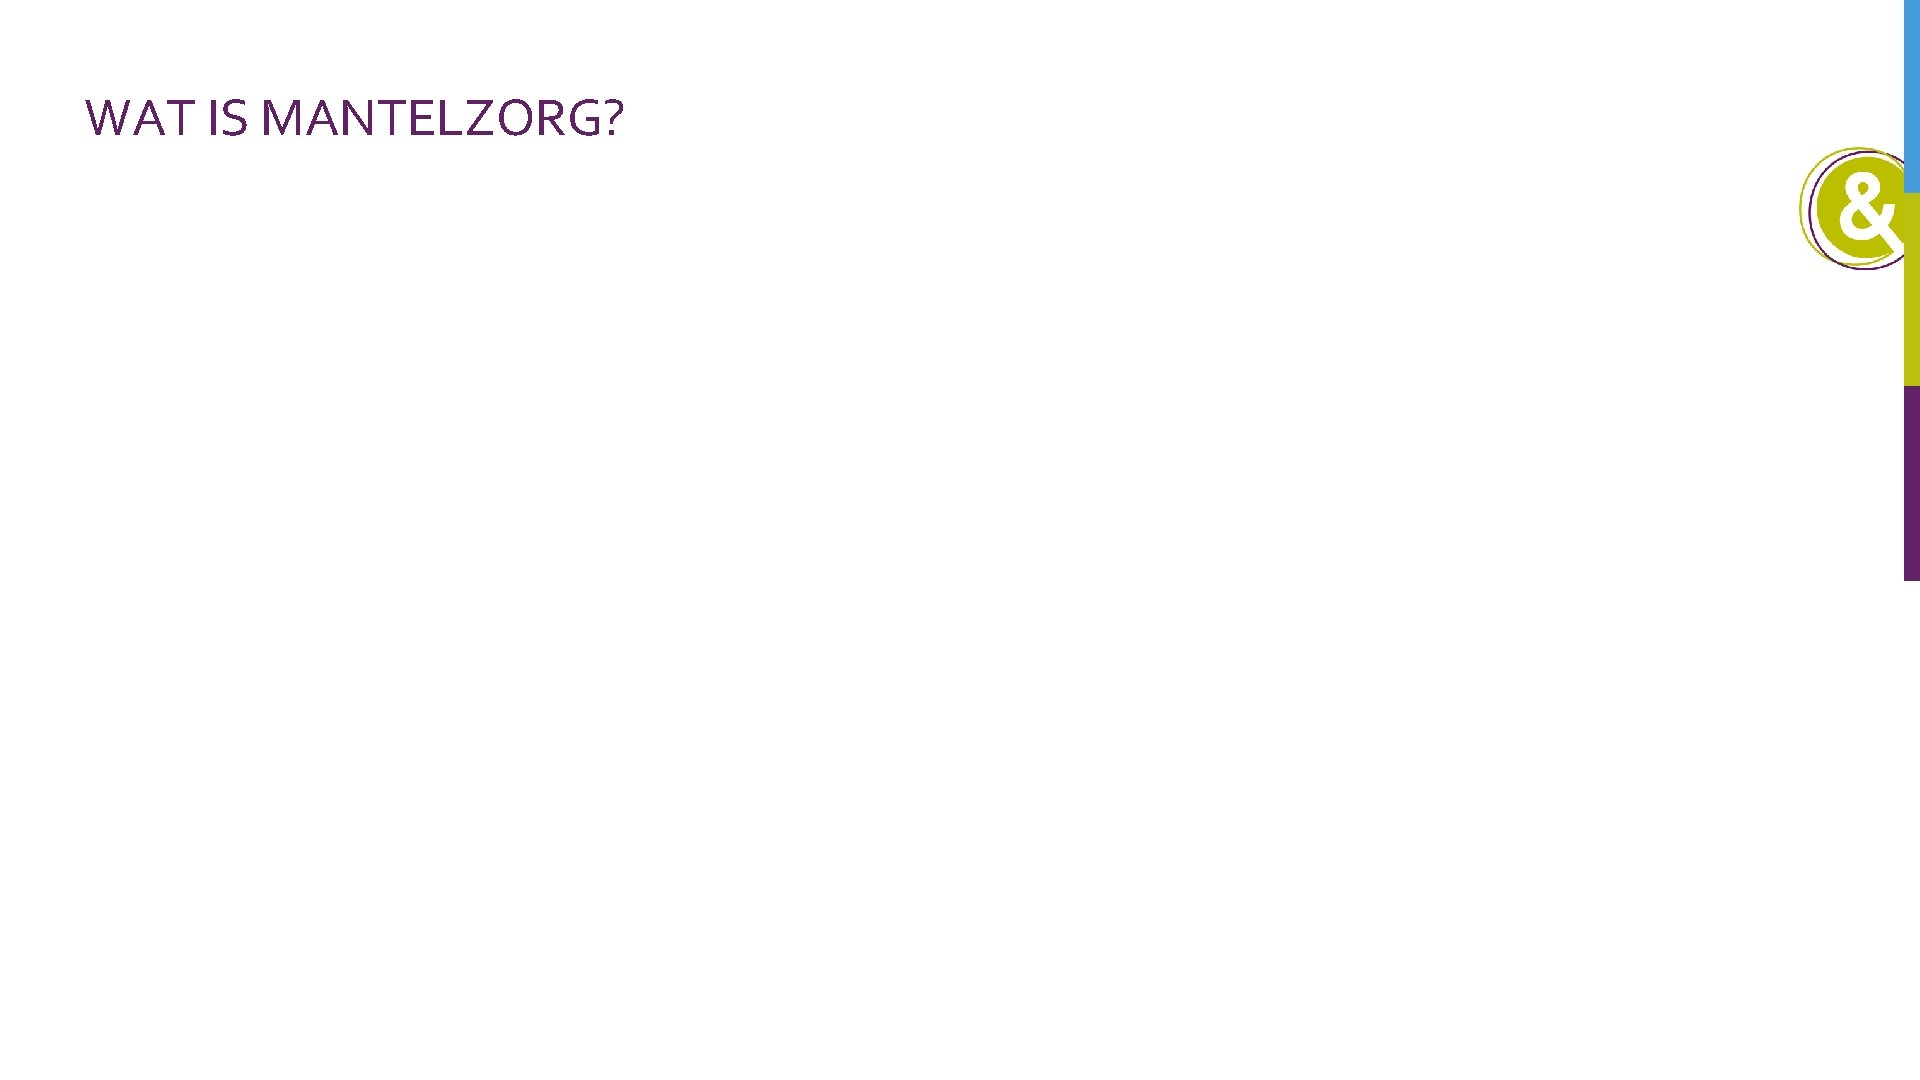 WAT IS MANTELZORG?